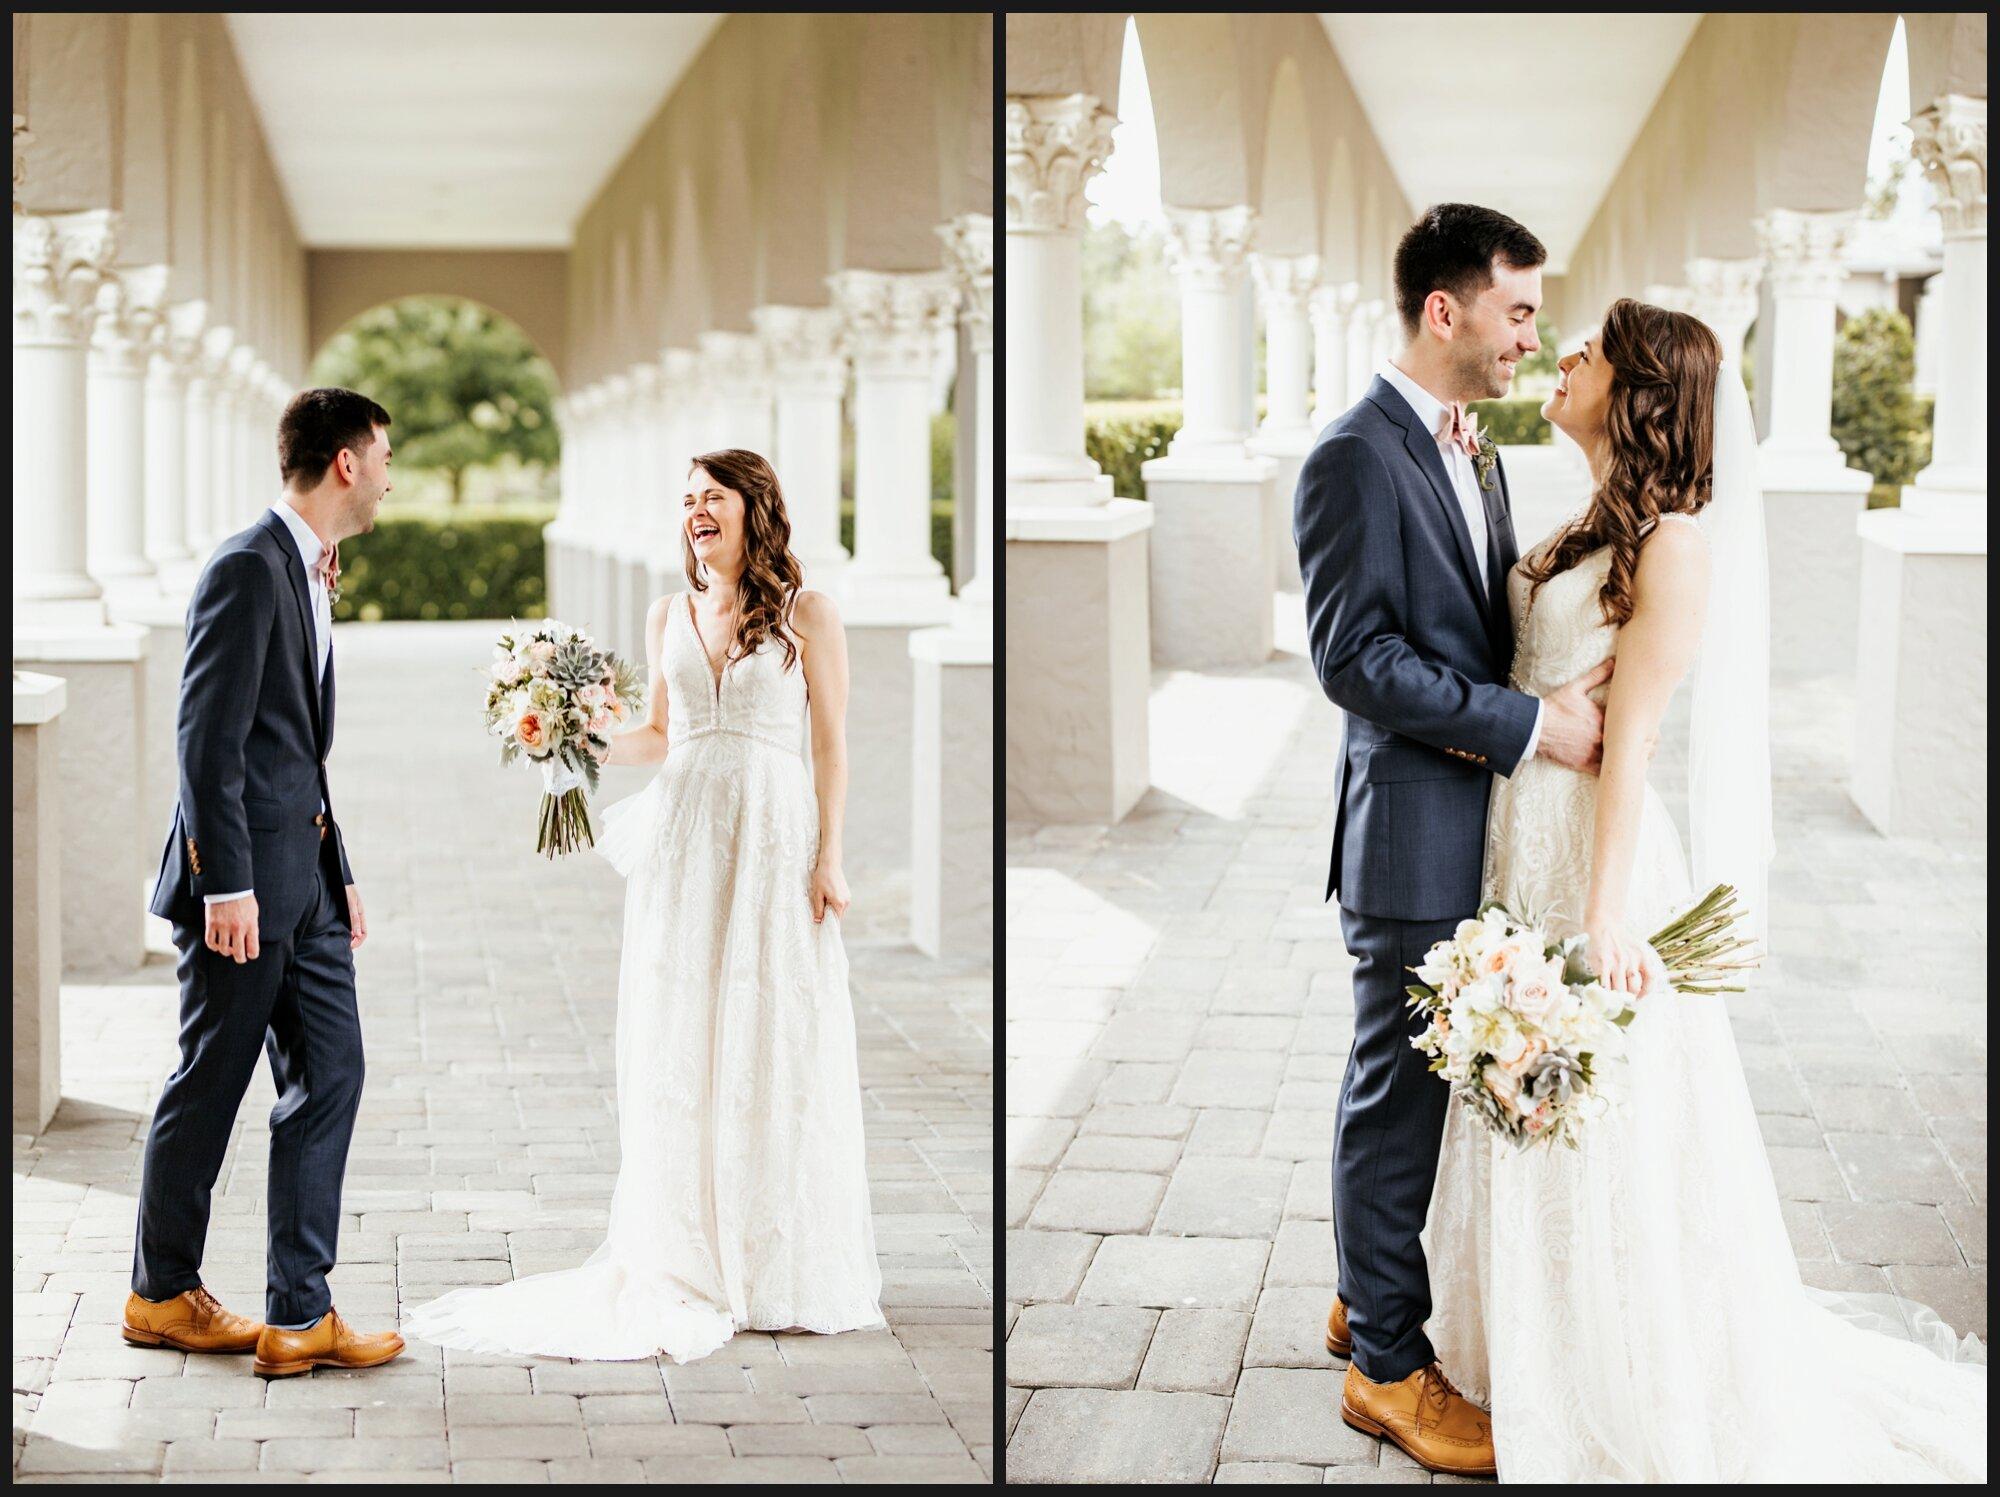 Orlando-Wedding-Photographer-destination-wedding-photographer-florida-wedding-photographer-hawaii-wedding-photographer_0632.jpg